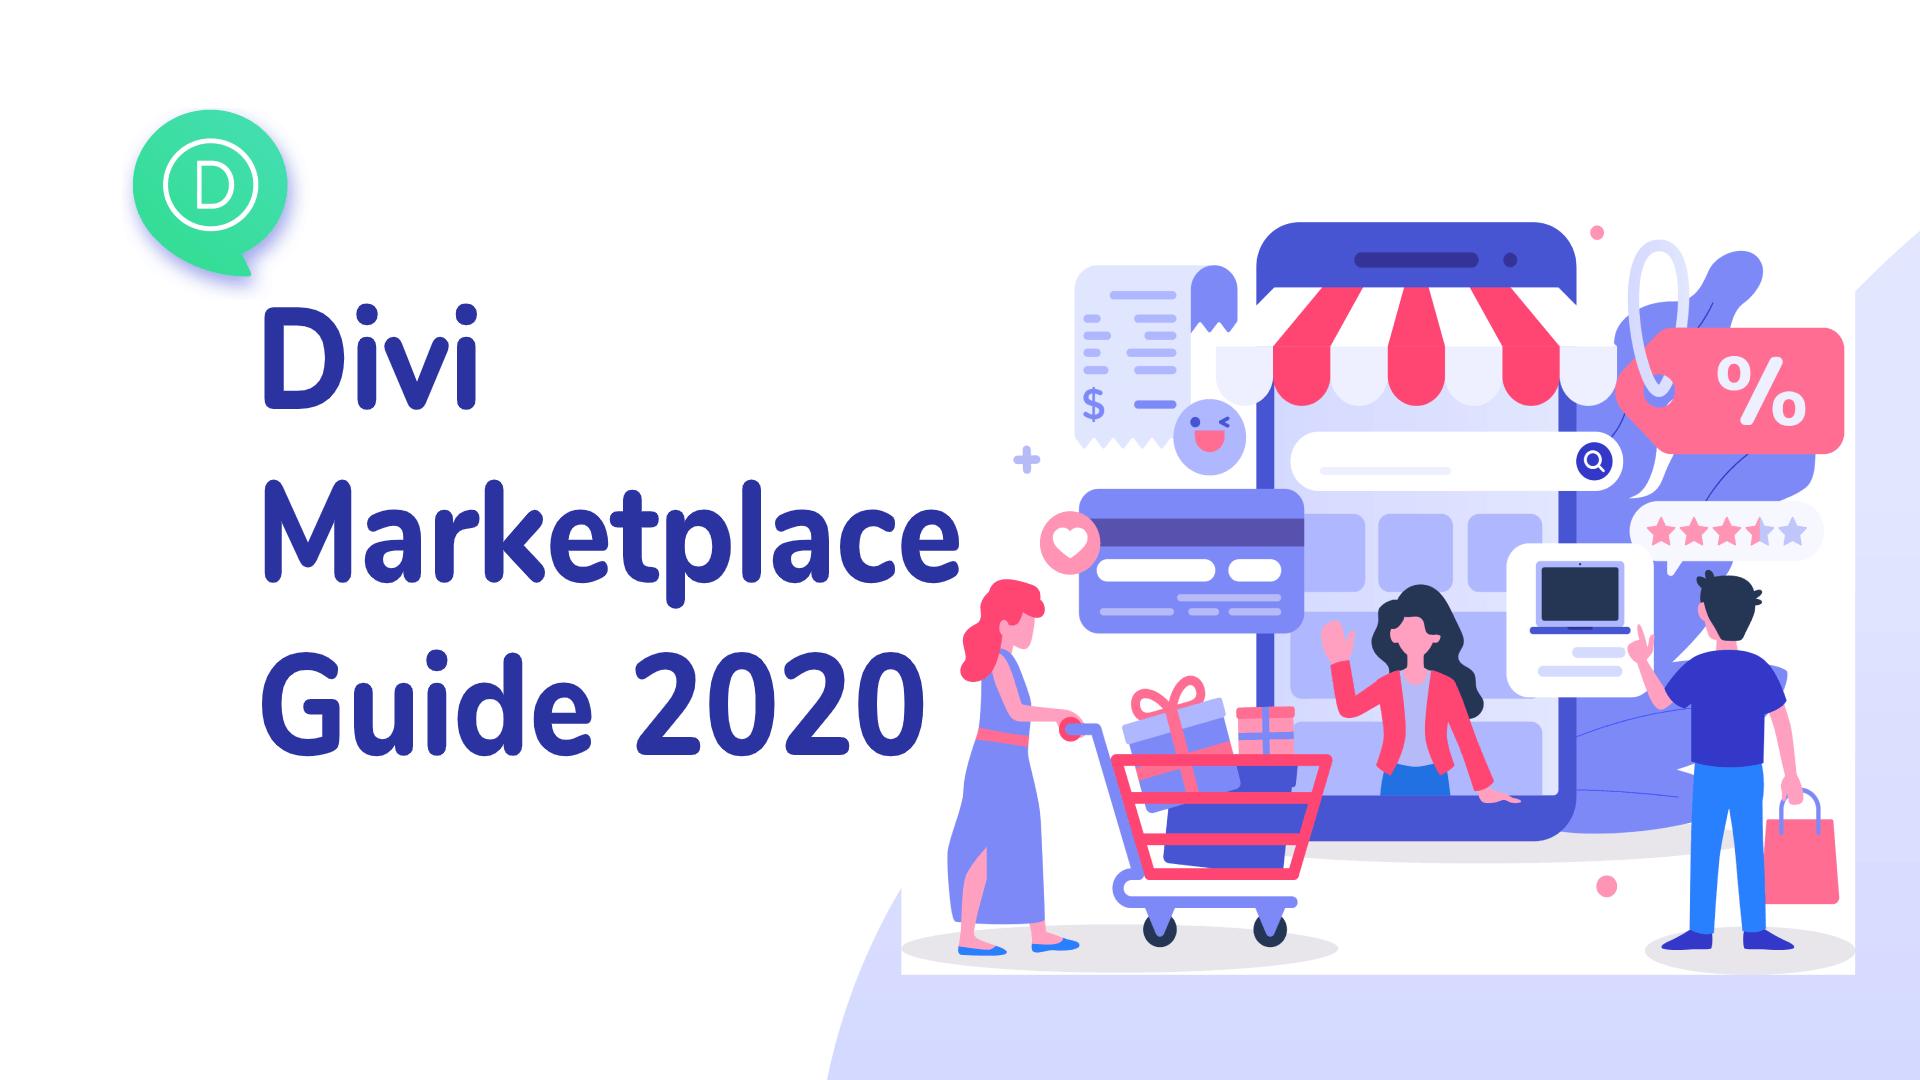 Divi Marketplace guide 2020